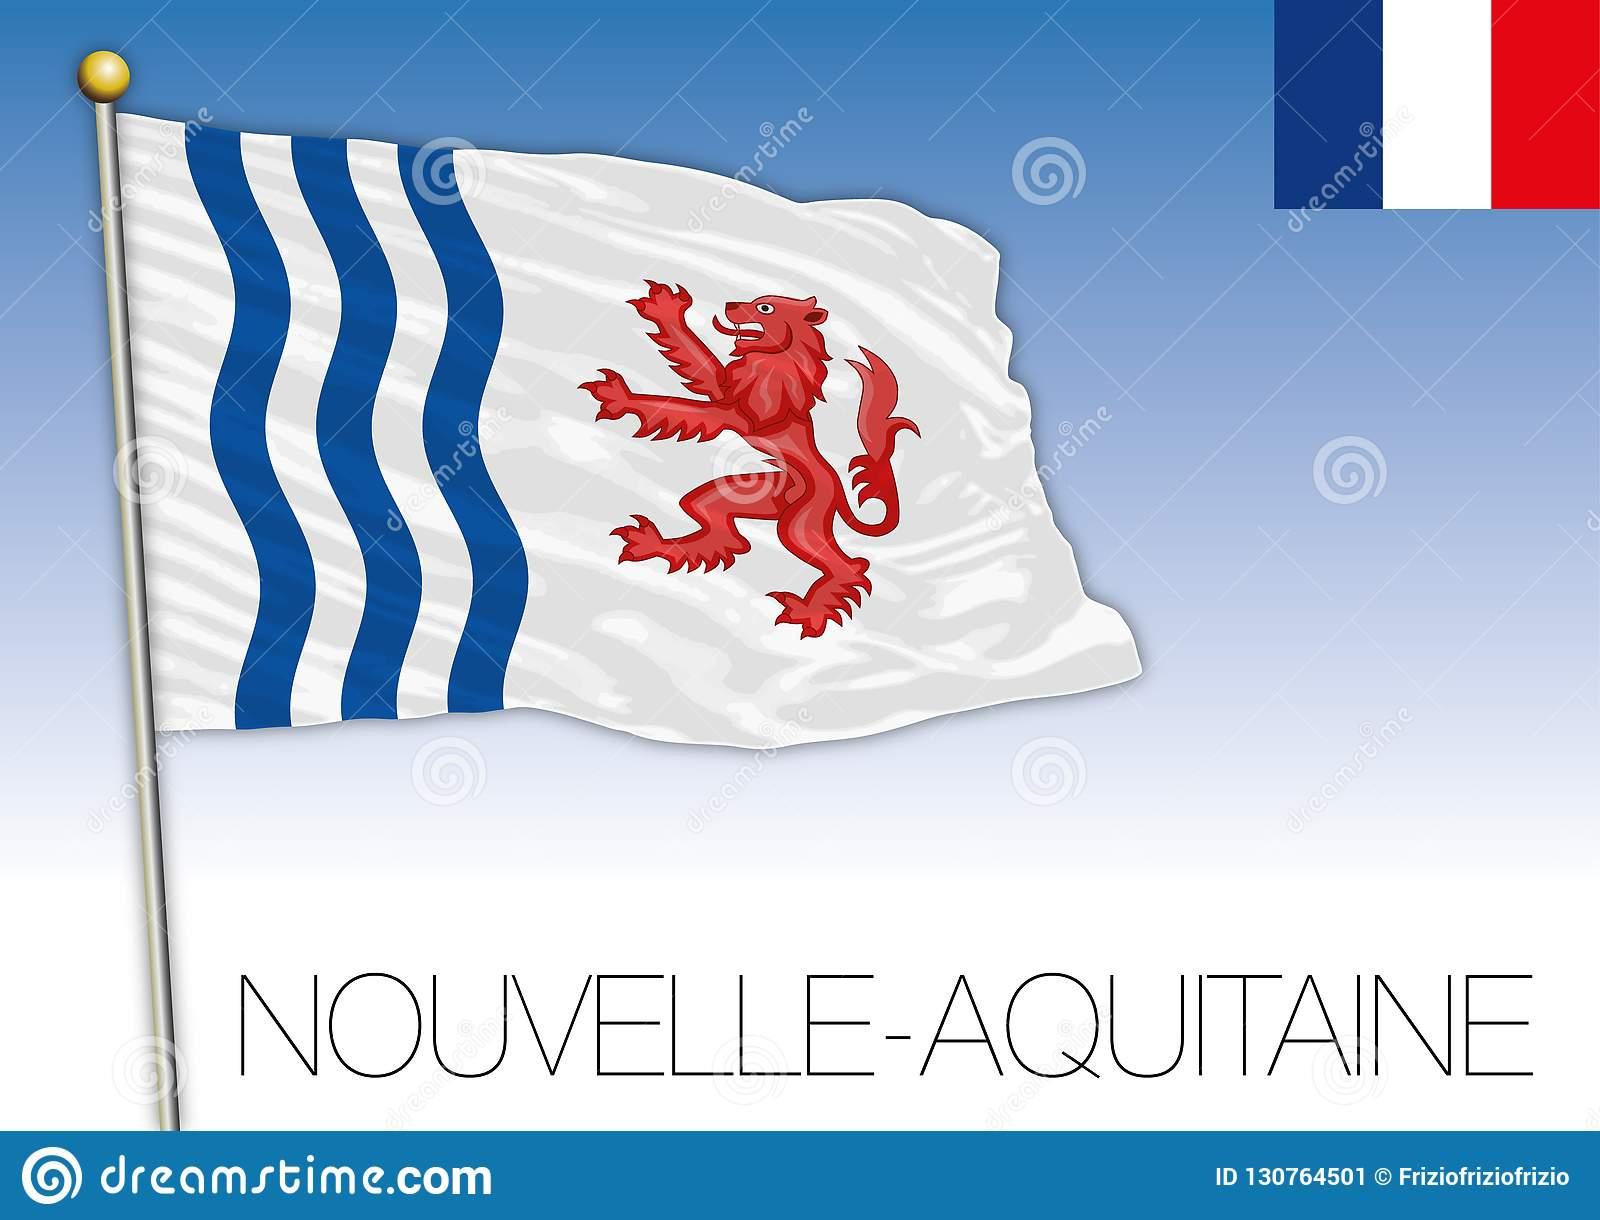 New Aquitaine Regional Flag, France, Vector Illustration pour Nouvelle Region France